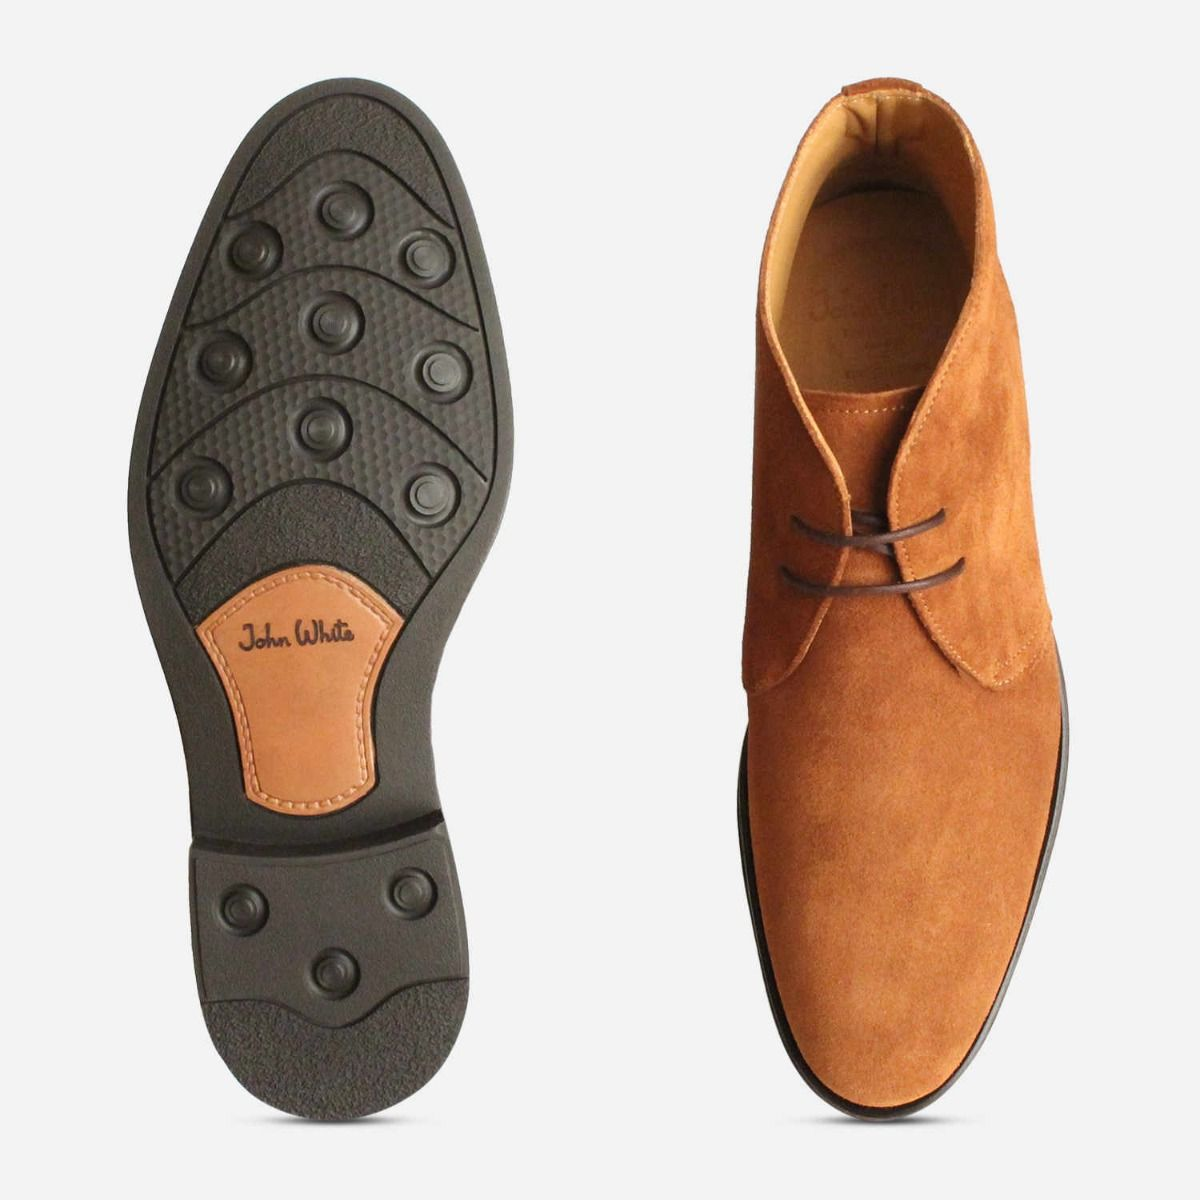 Cognac Suede Westbury 5 John White Ankle Boots